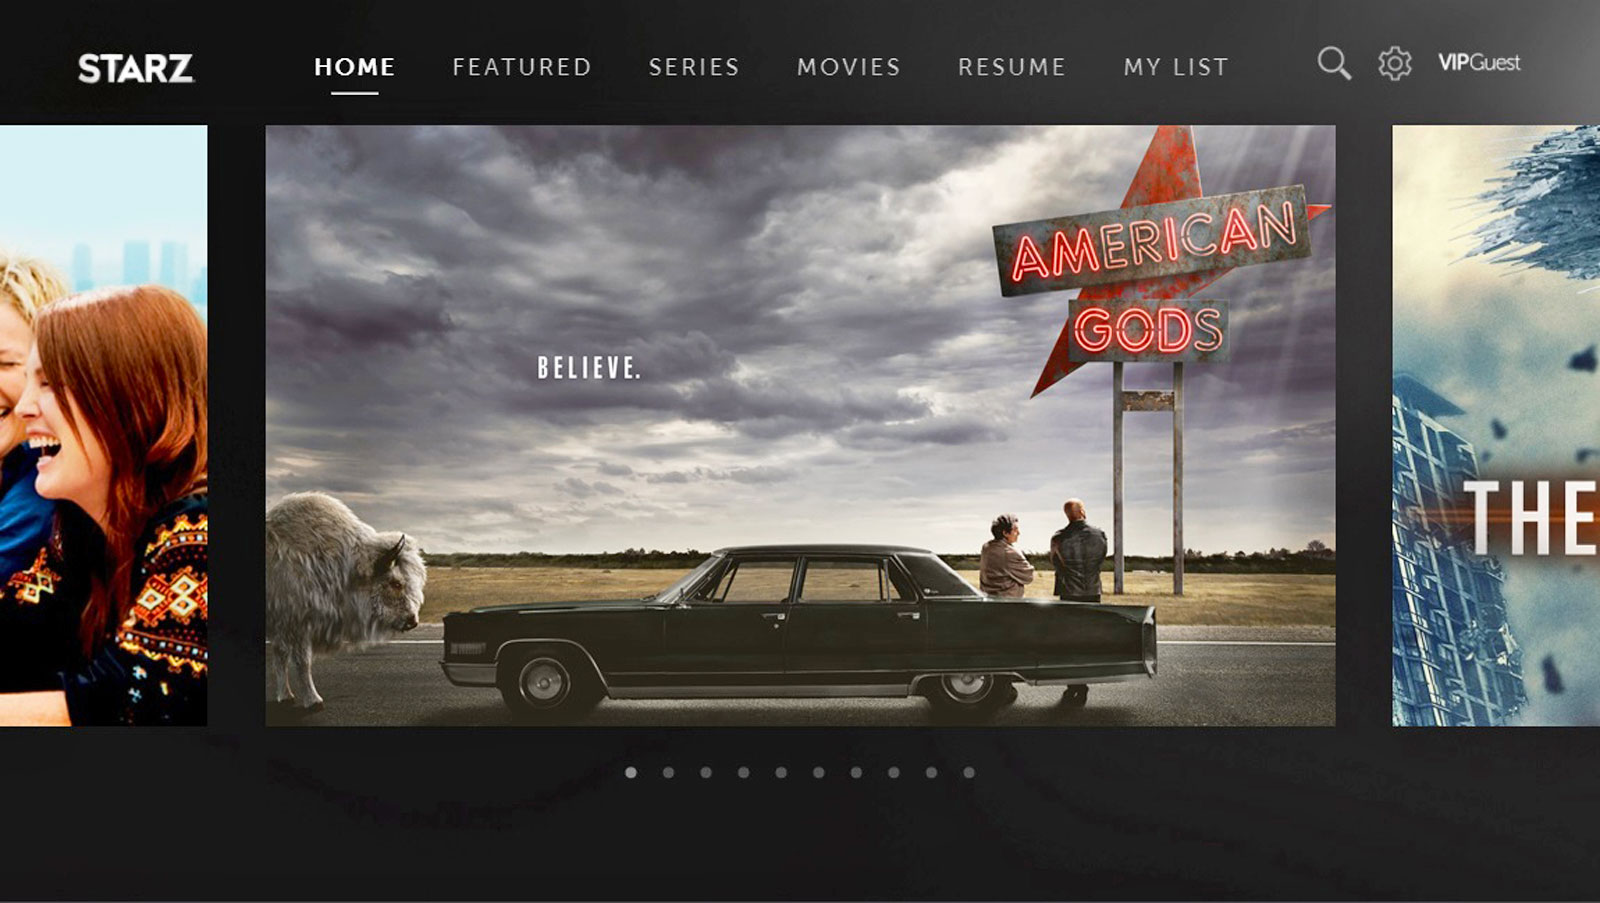 Starz app streams 'American Gods' to your Samsung Smart TV